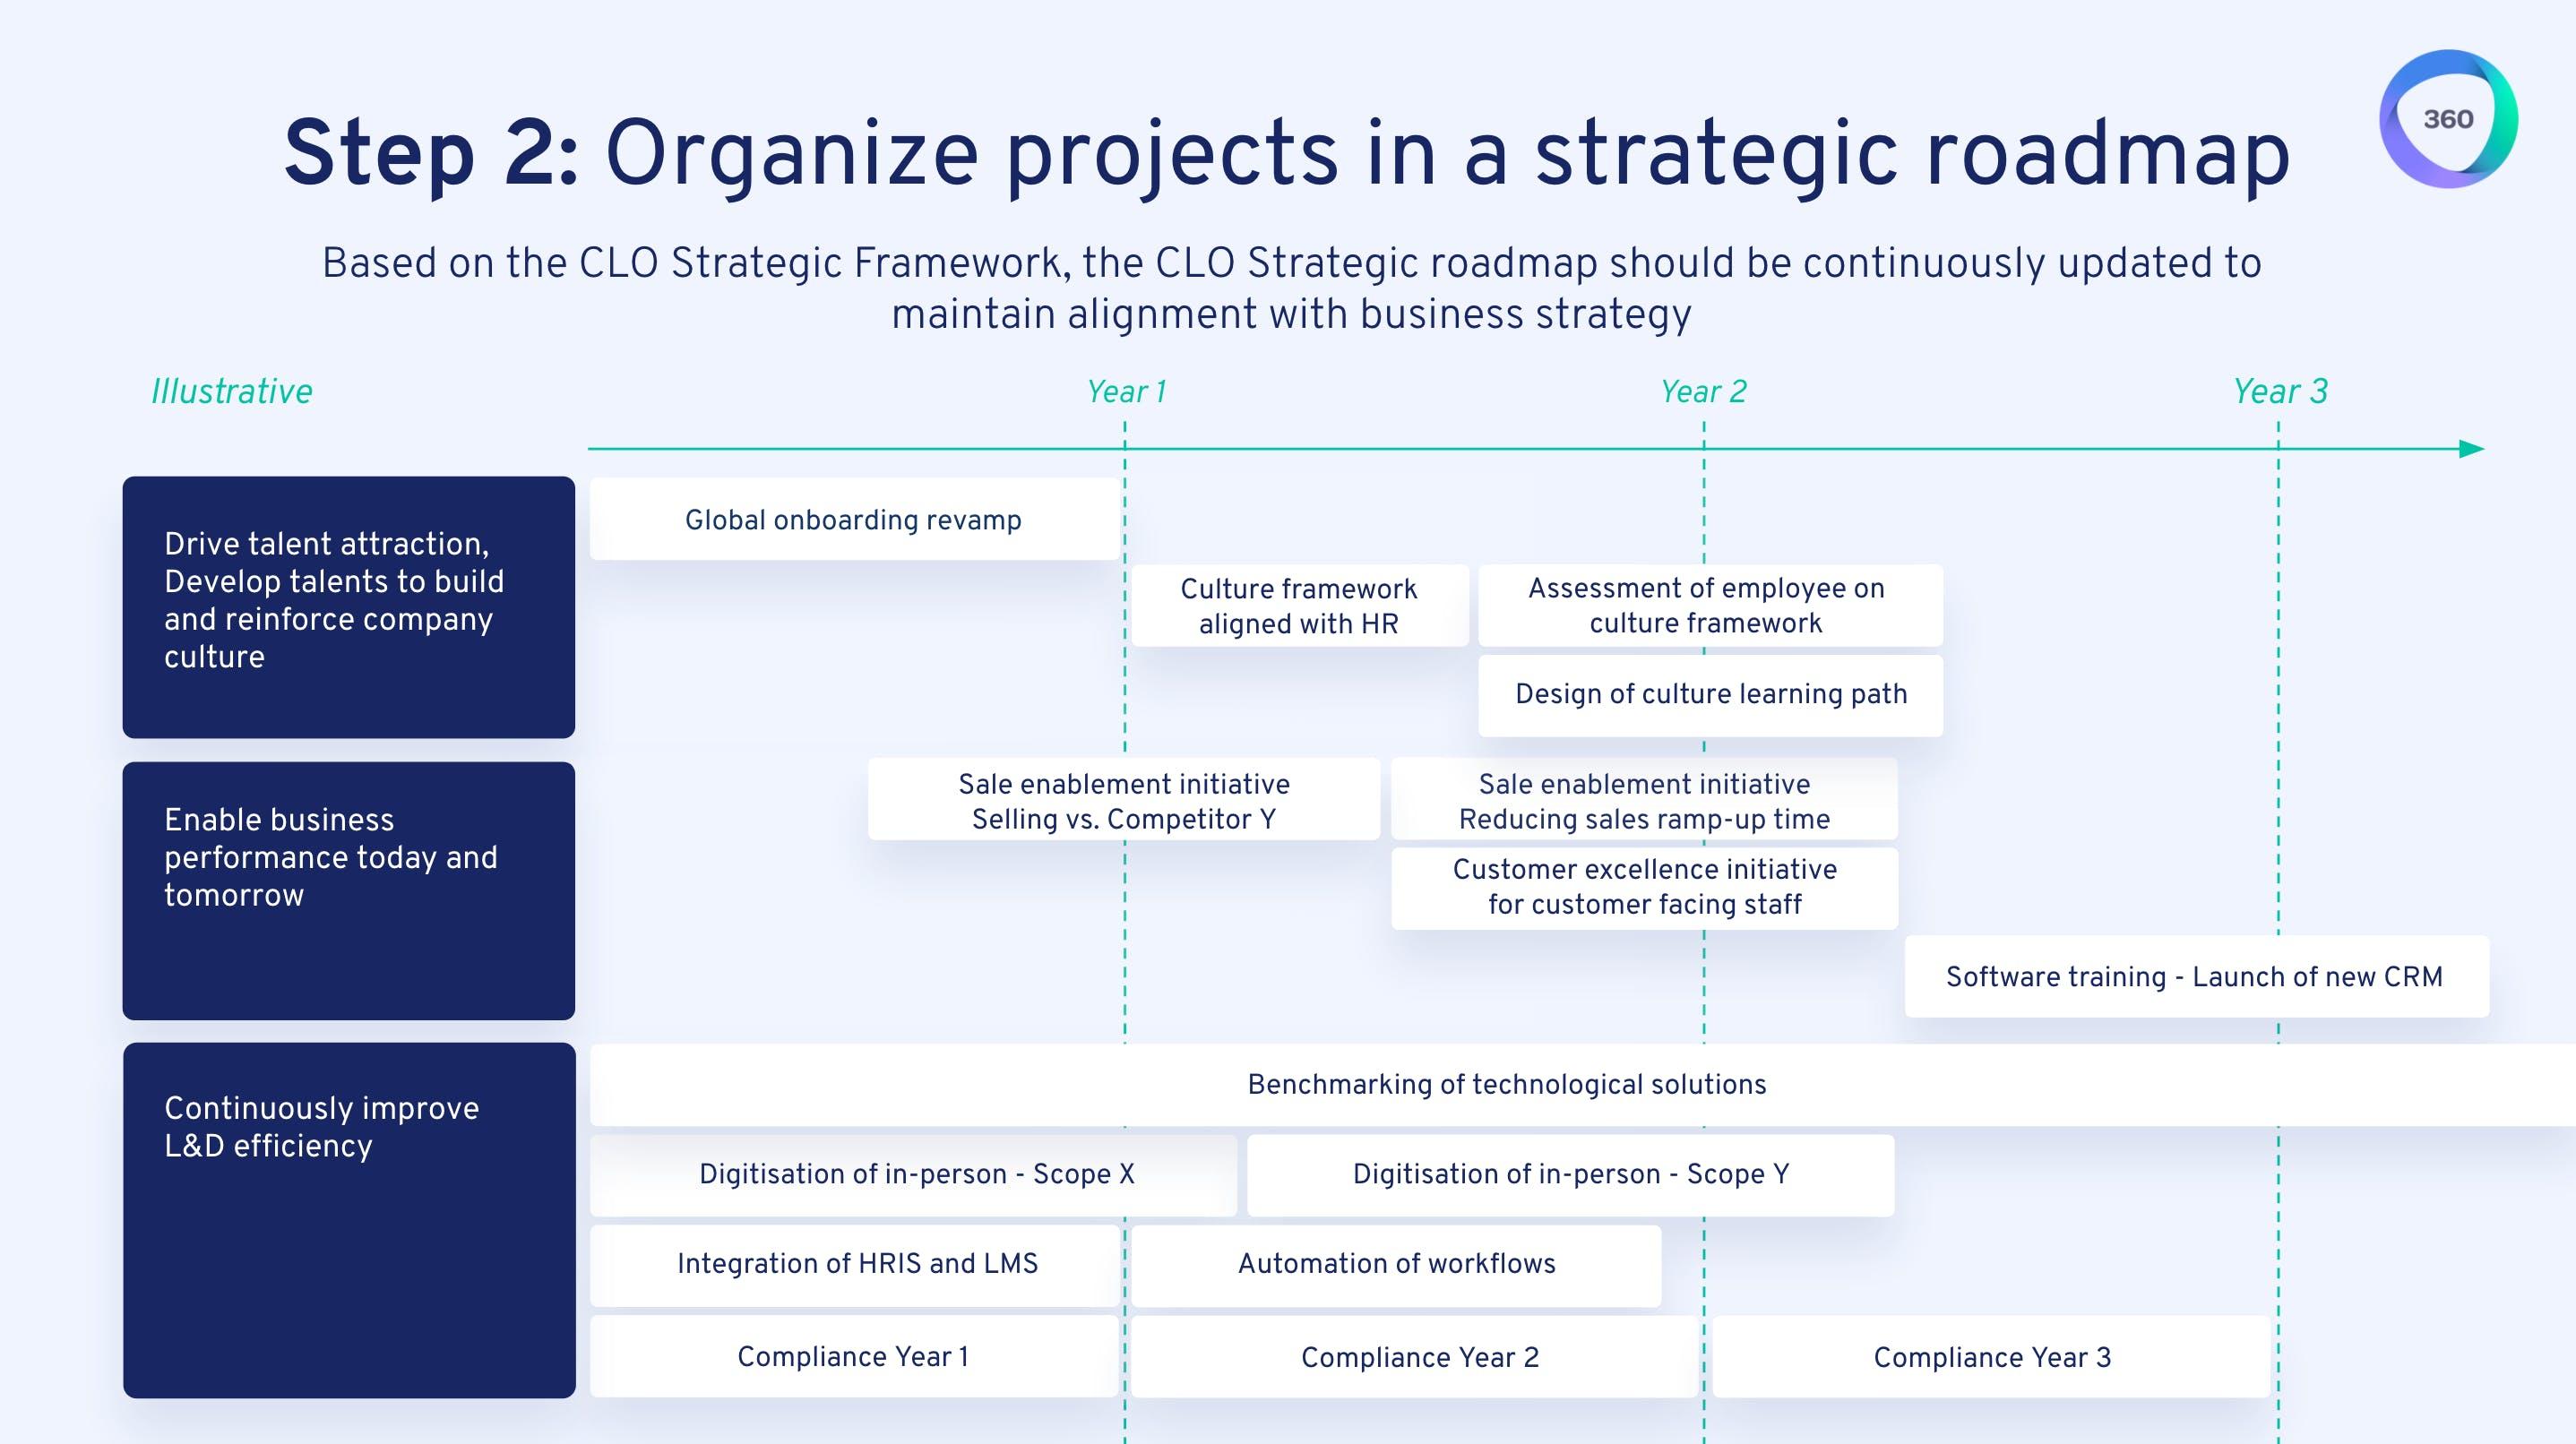 Step 2: Strategic roadmap example